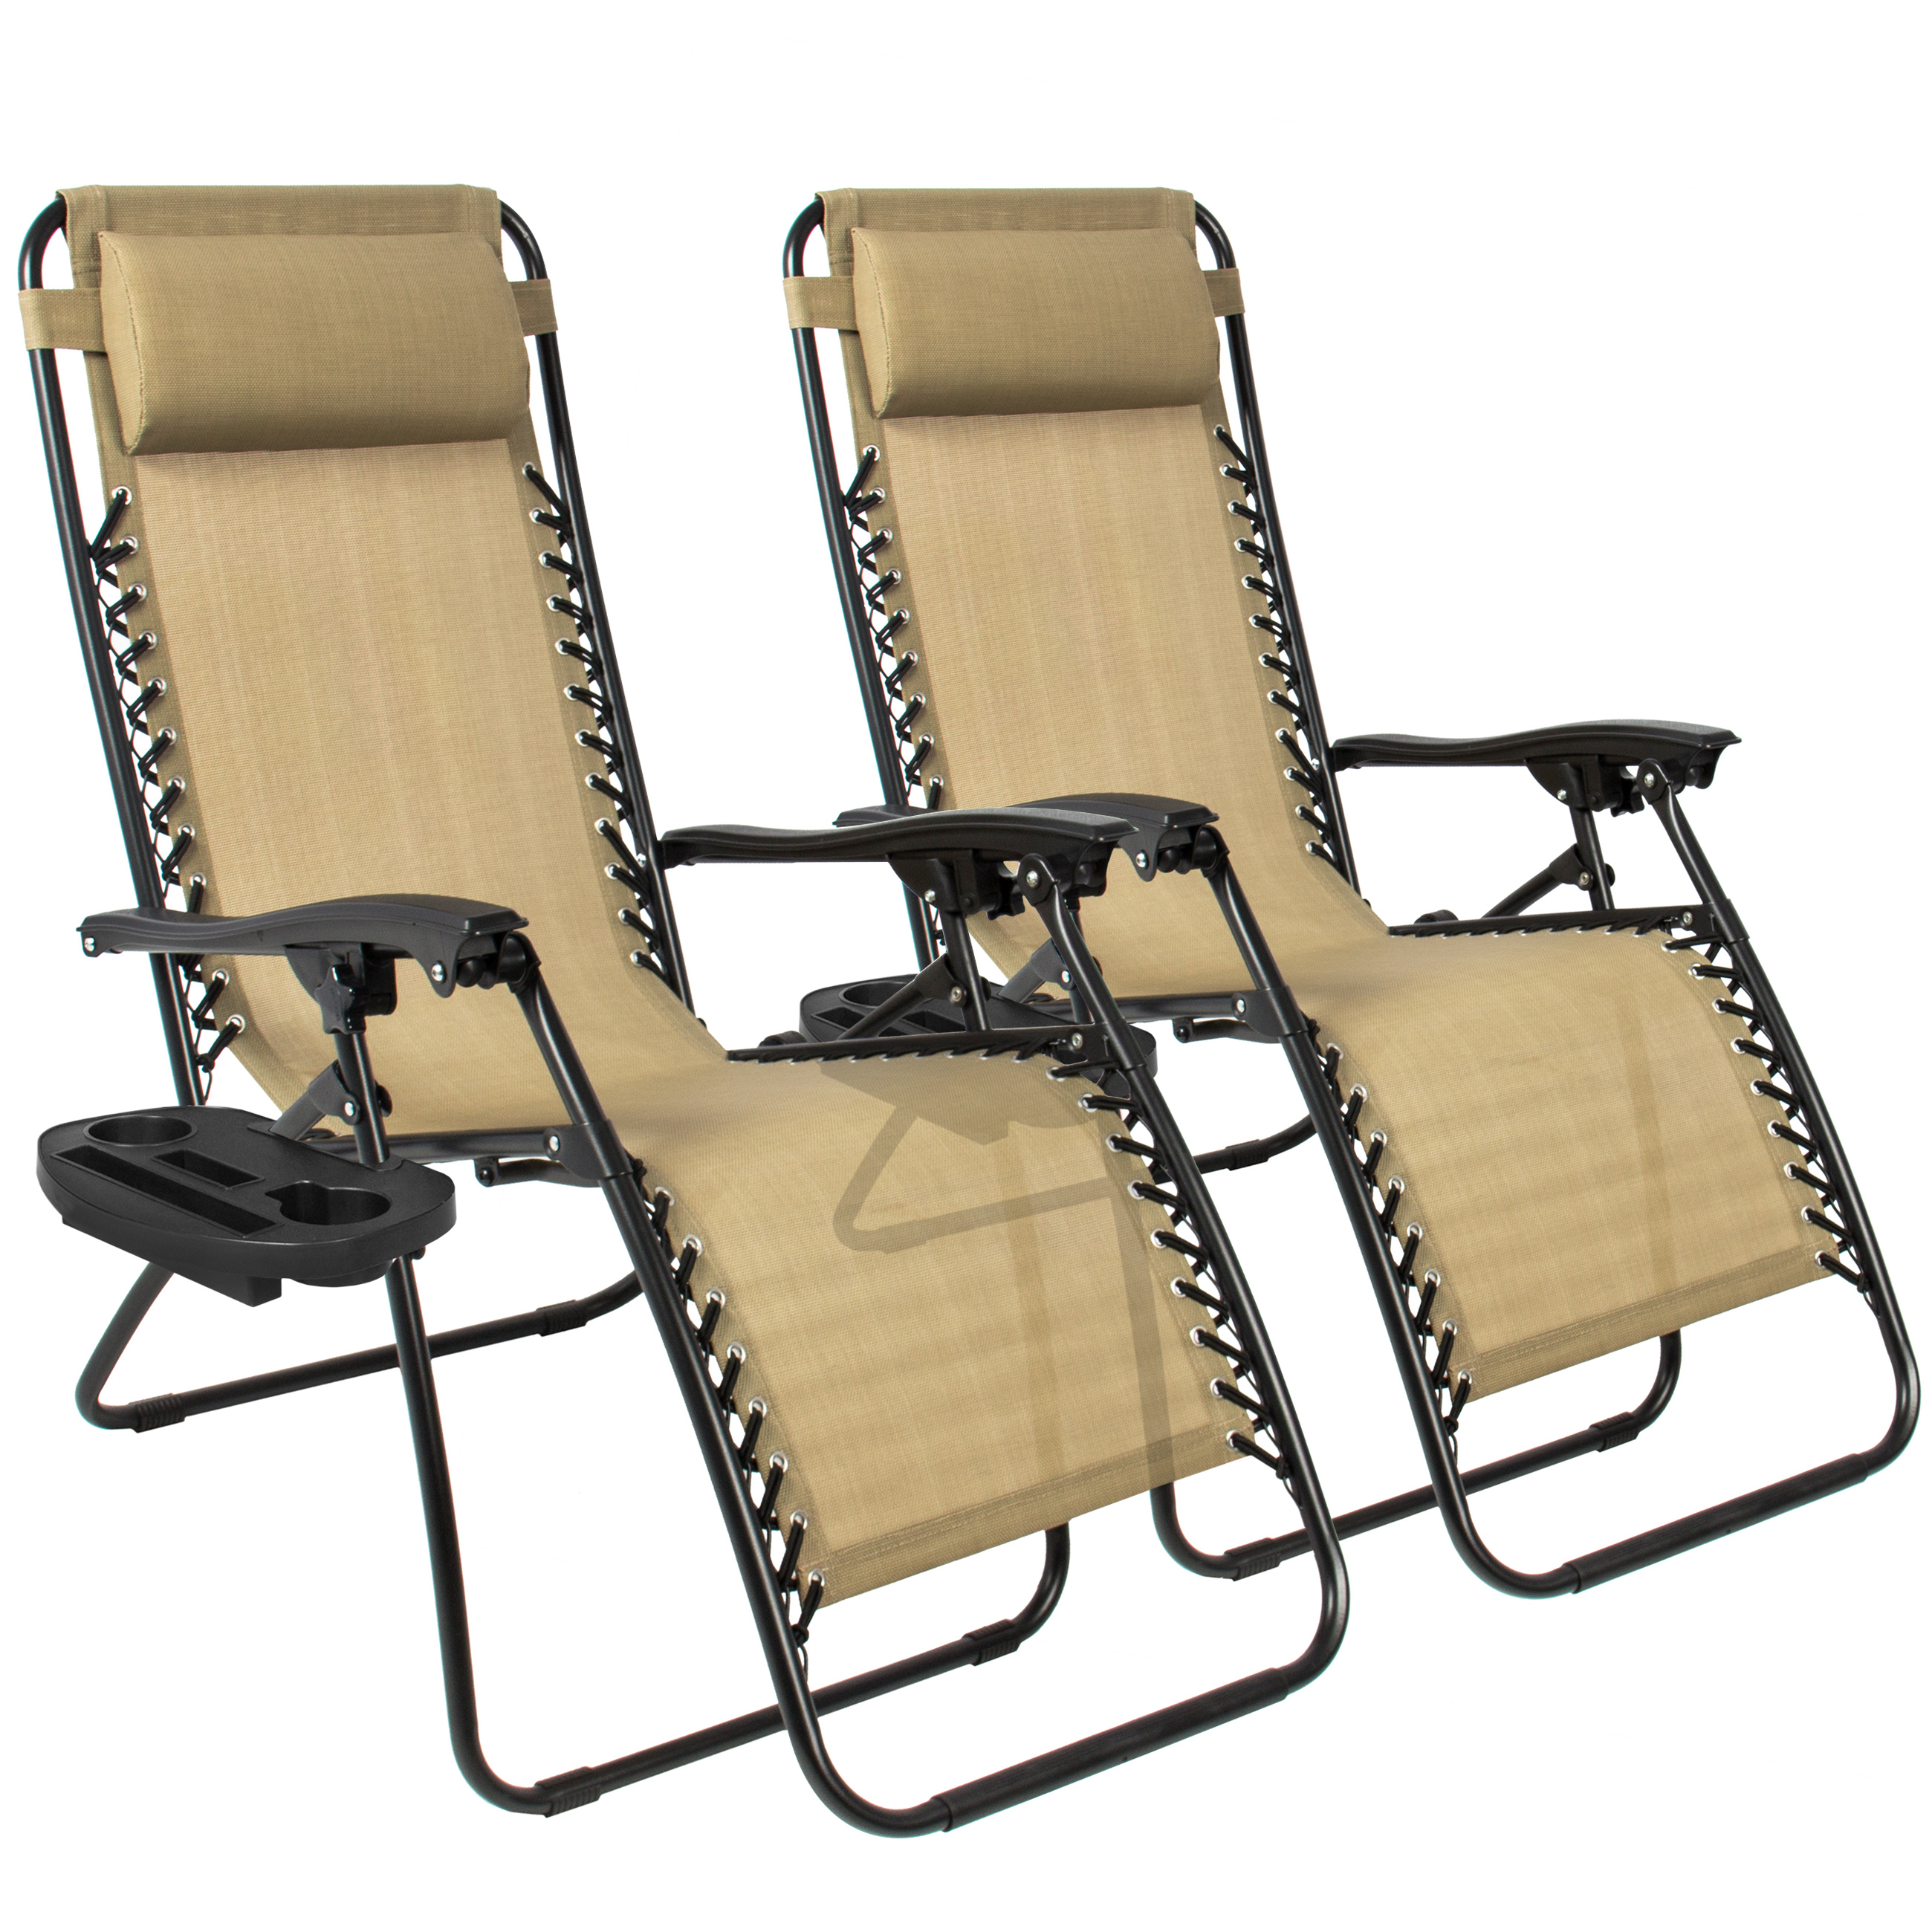 Zero Gravity Chairs Case Of (2) Lounge Patio Chairs Outdoor Yard Beach New